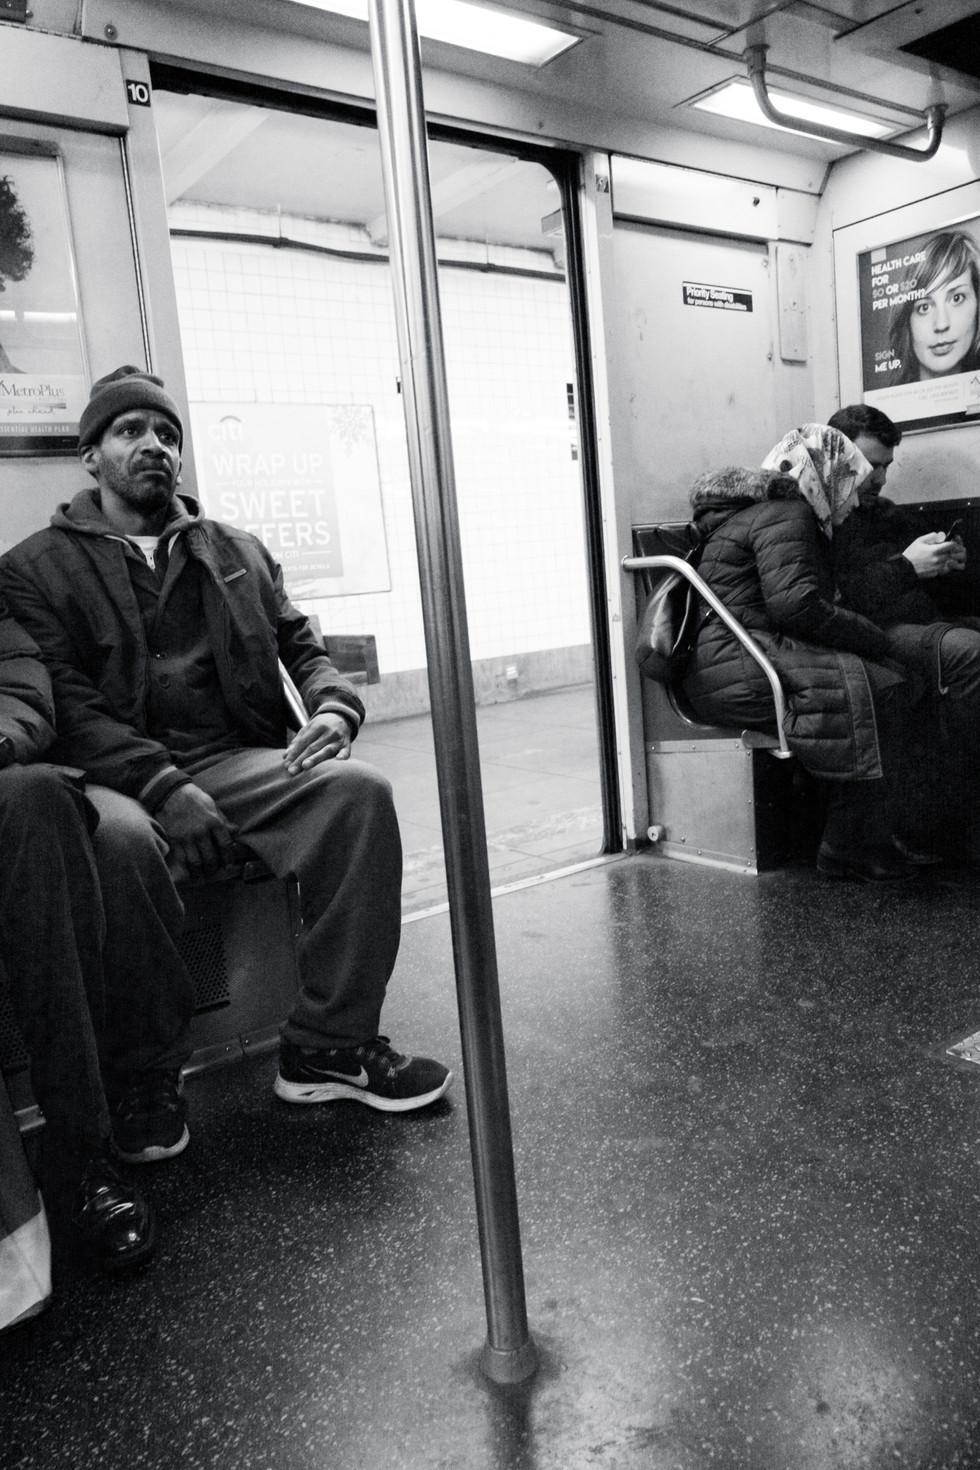 20151230-new york city-477.jpg